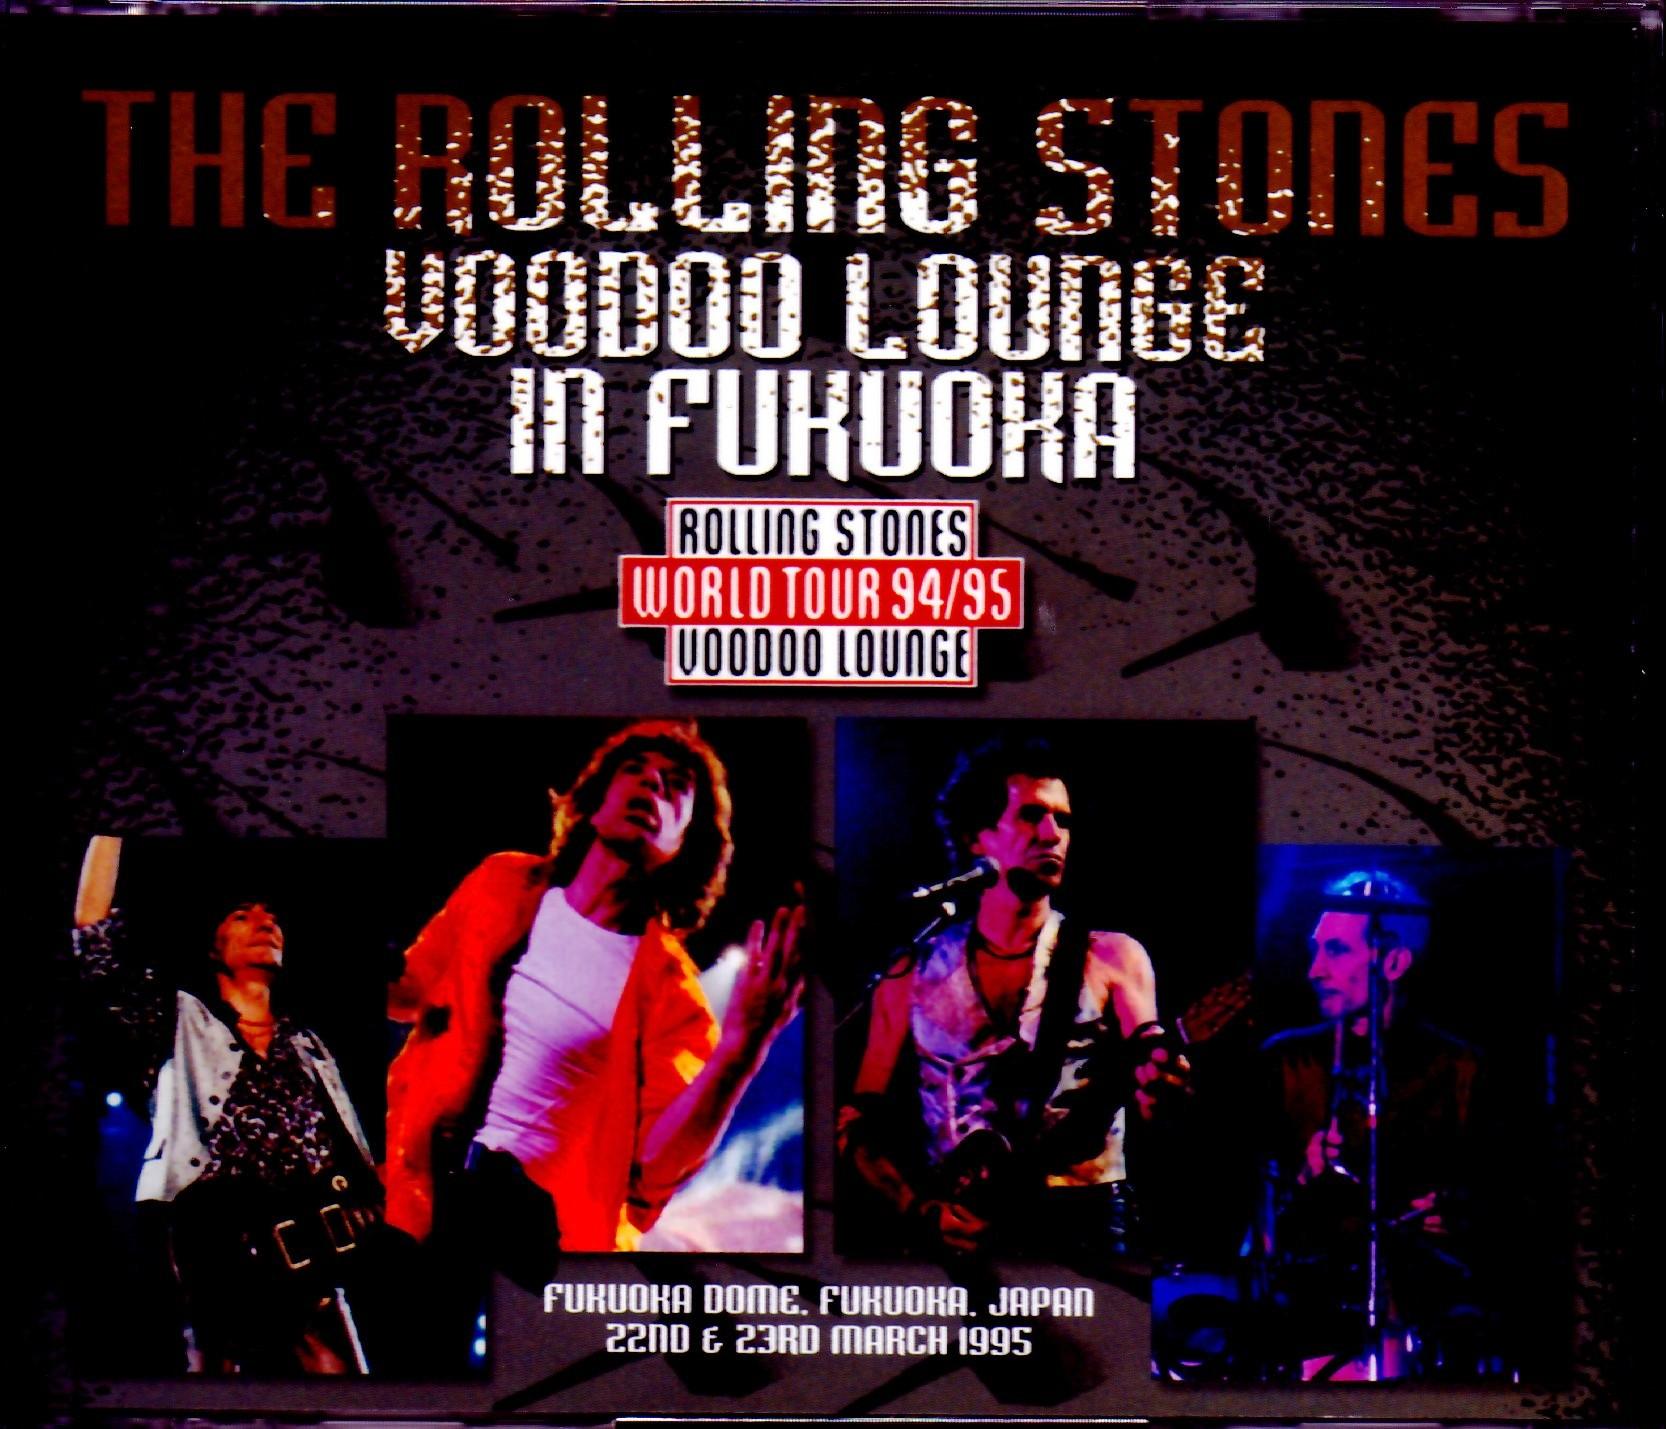 Rolling Stones ローリング・ストーンズ/Fukuoka,Japan 1995 2 Days